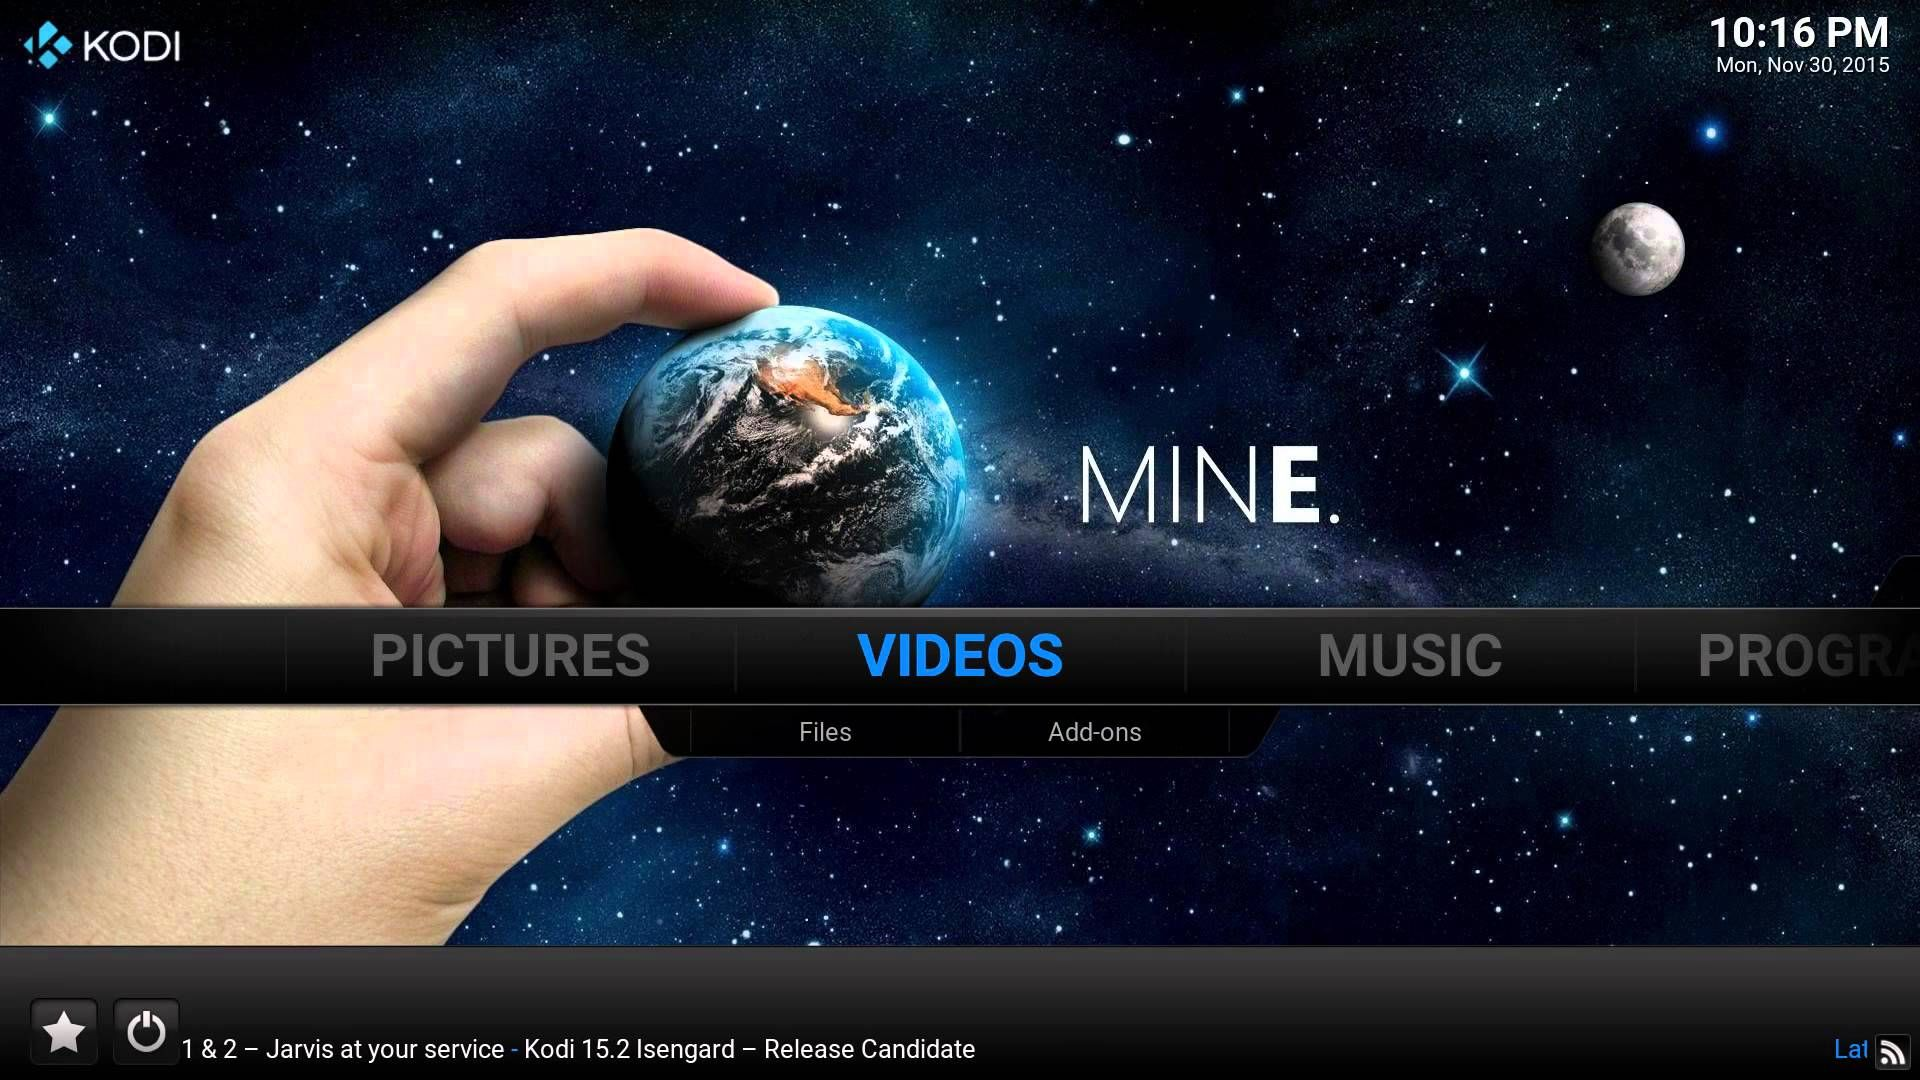 FREE IPTV STALKER clone i4atv v10 with iVue TV Guide!!! XBMC